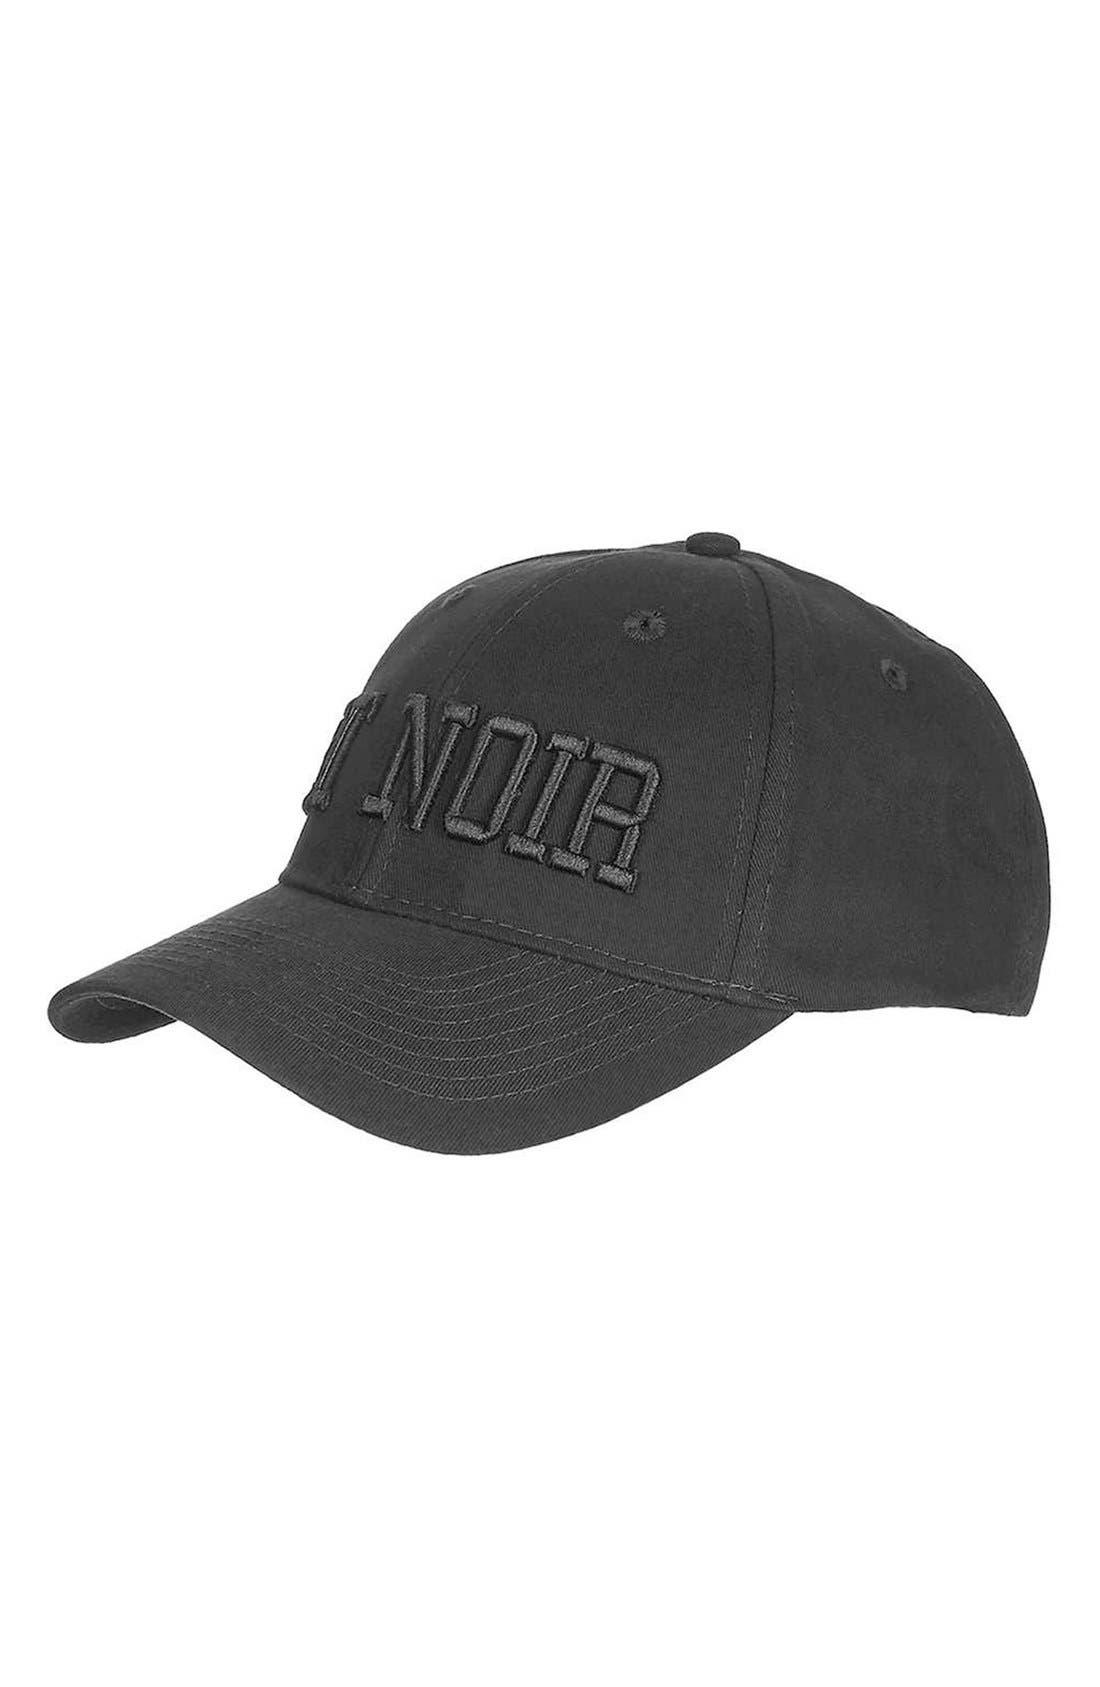 Alternate Image 1 Selected - Topshop Et Noir Baseball Cap